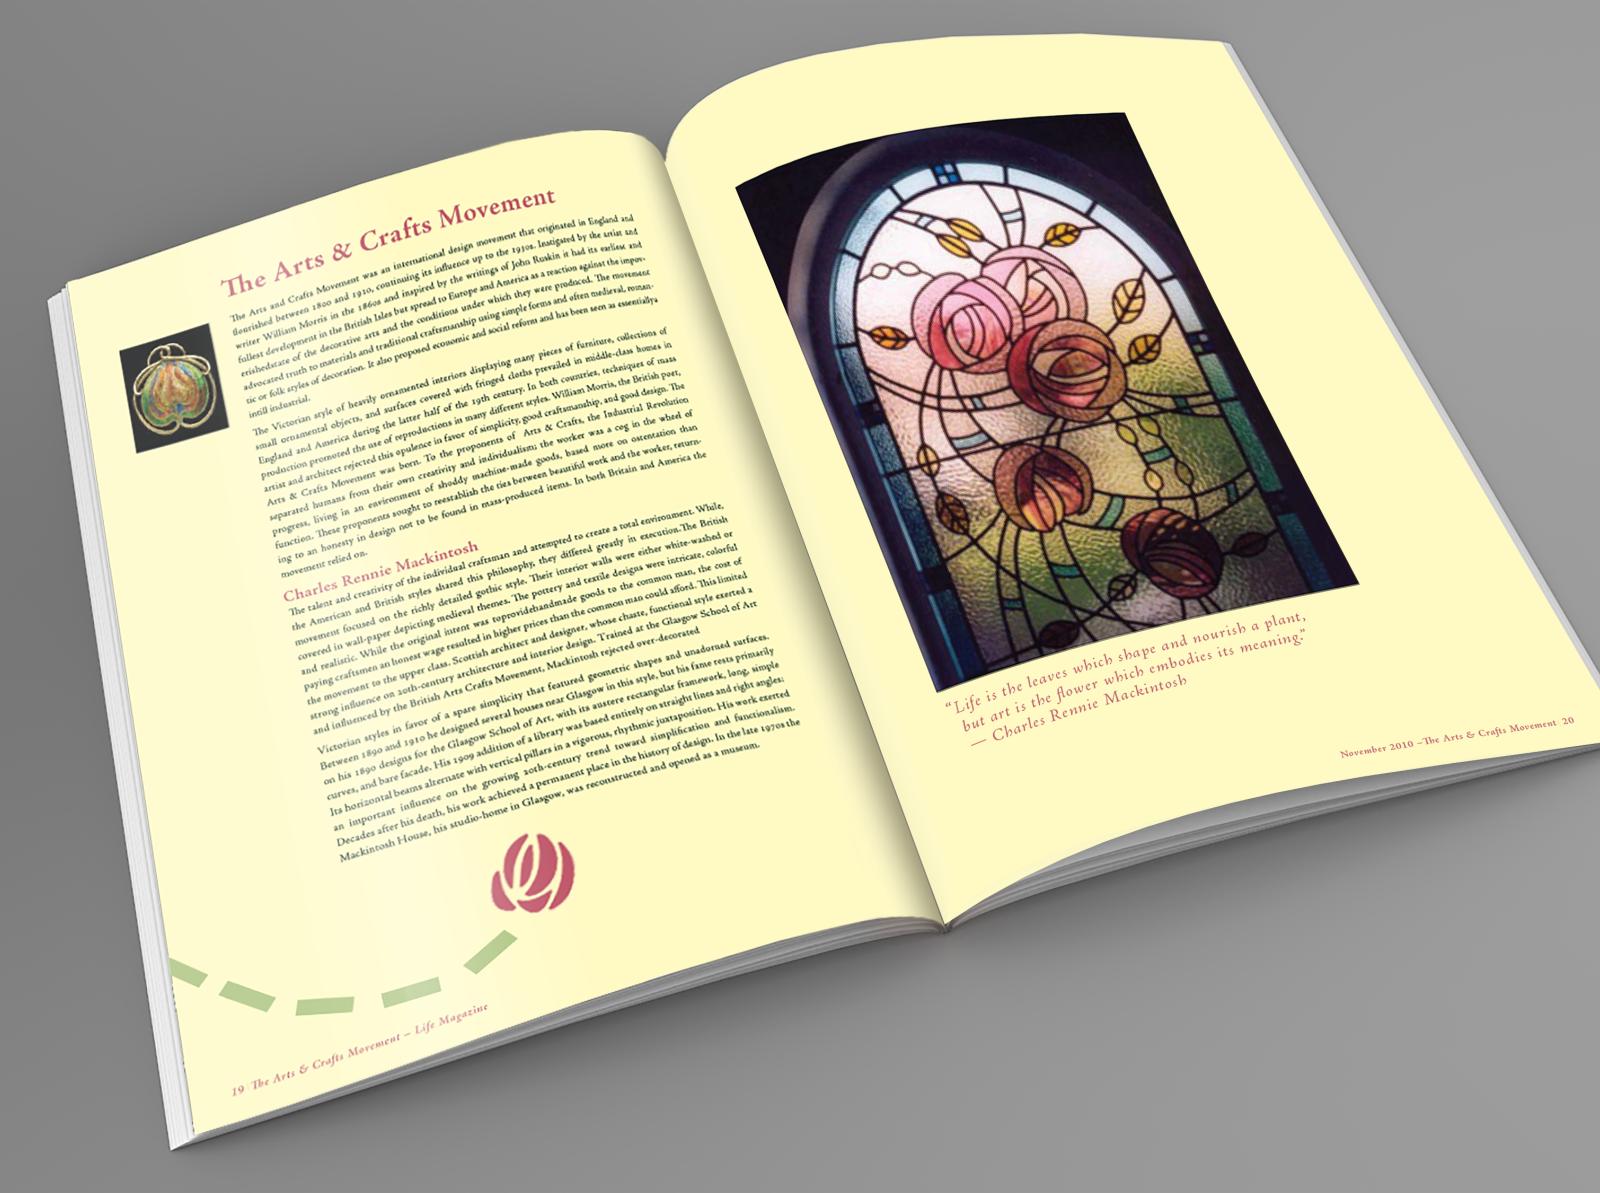 Arts And Craft Movement Magazine Spread By Nicholas Navarro On Dribbble